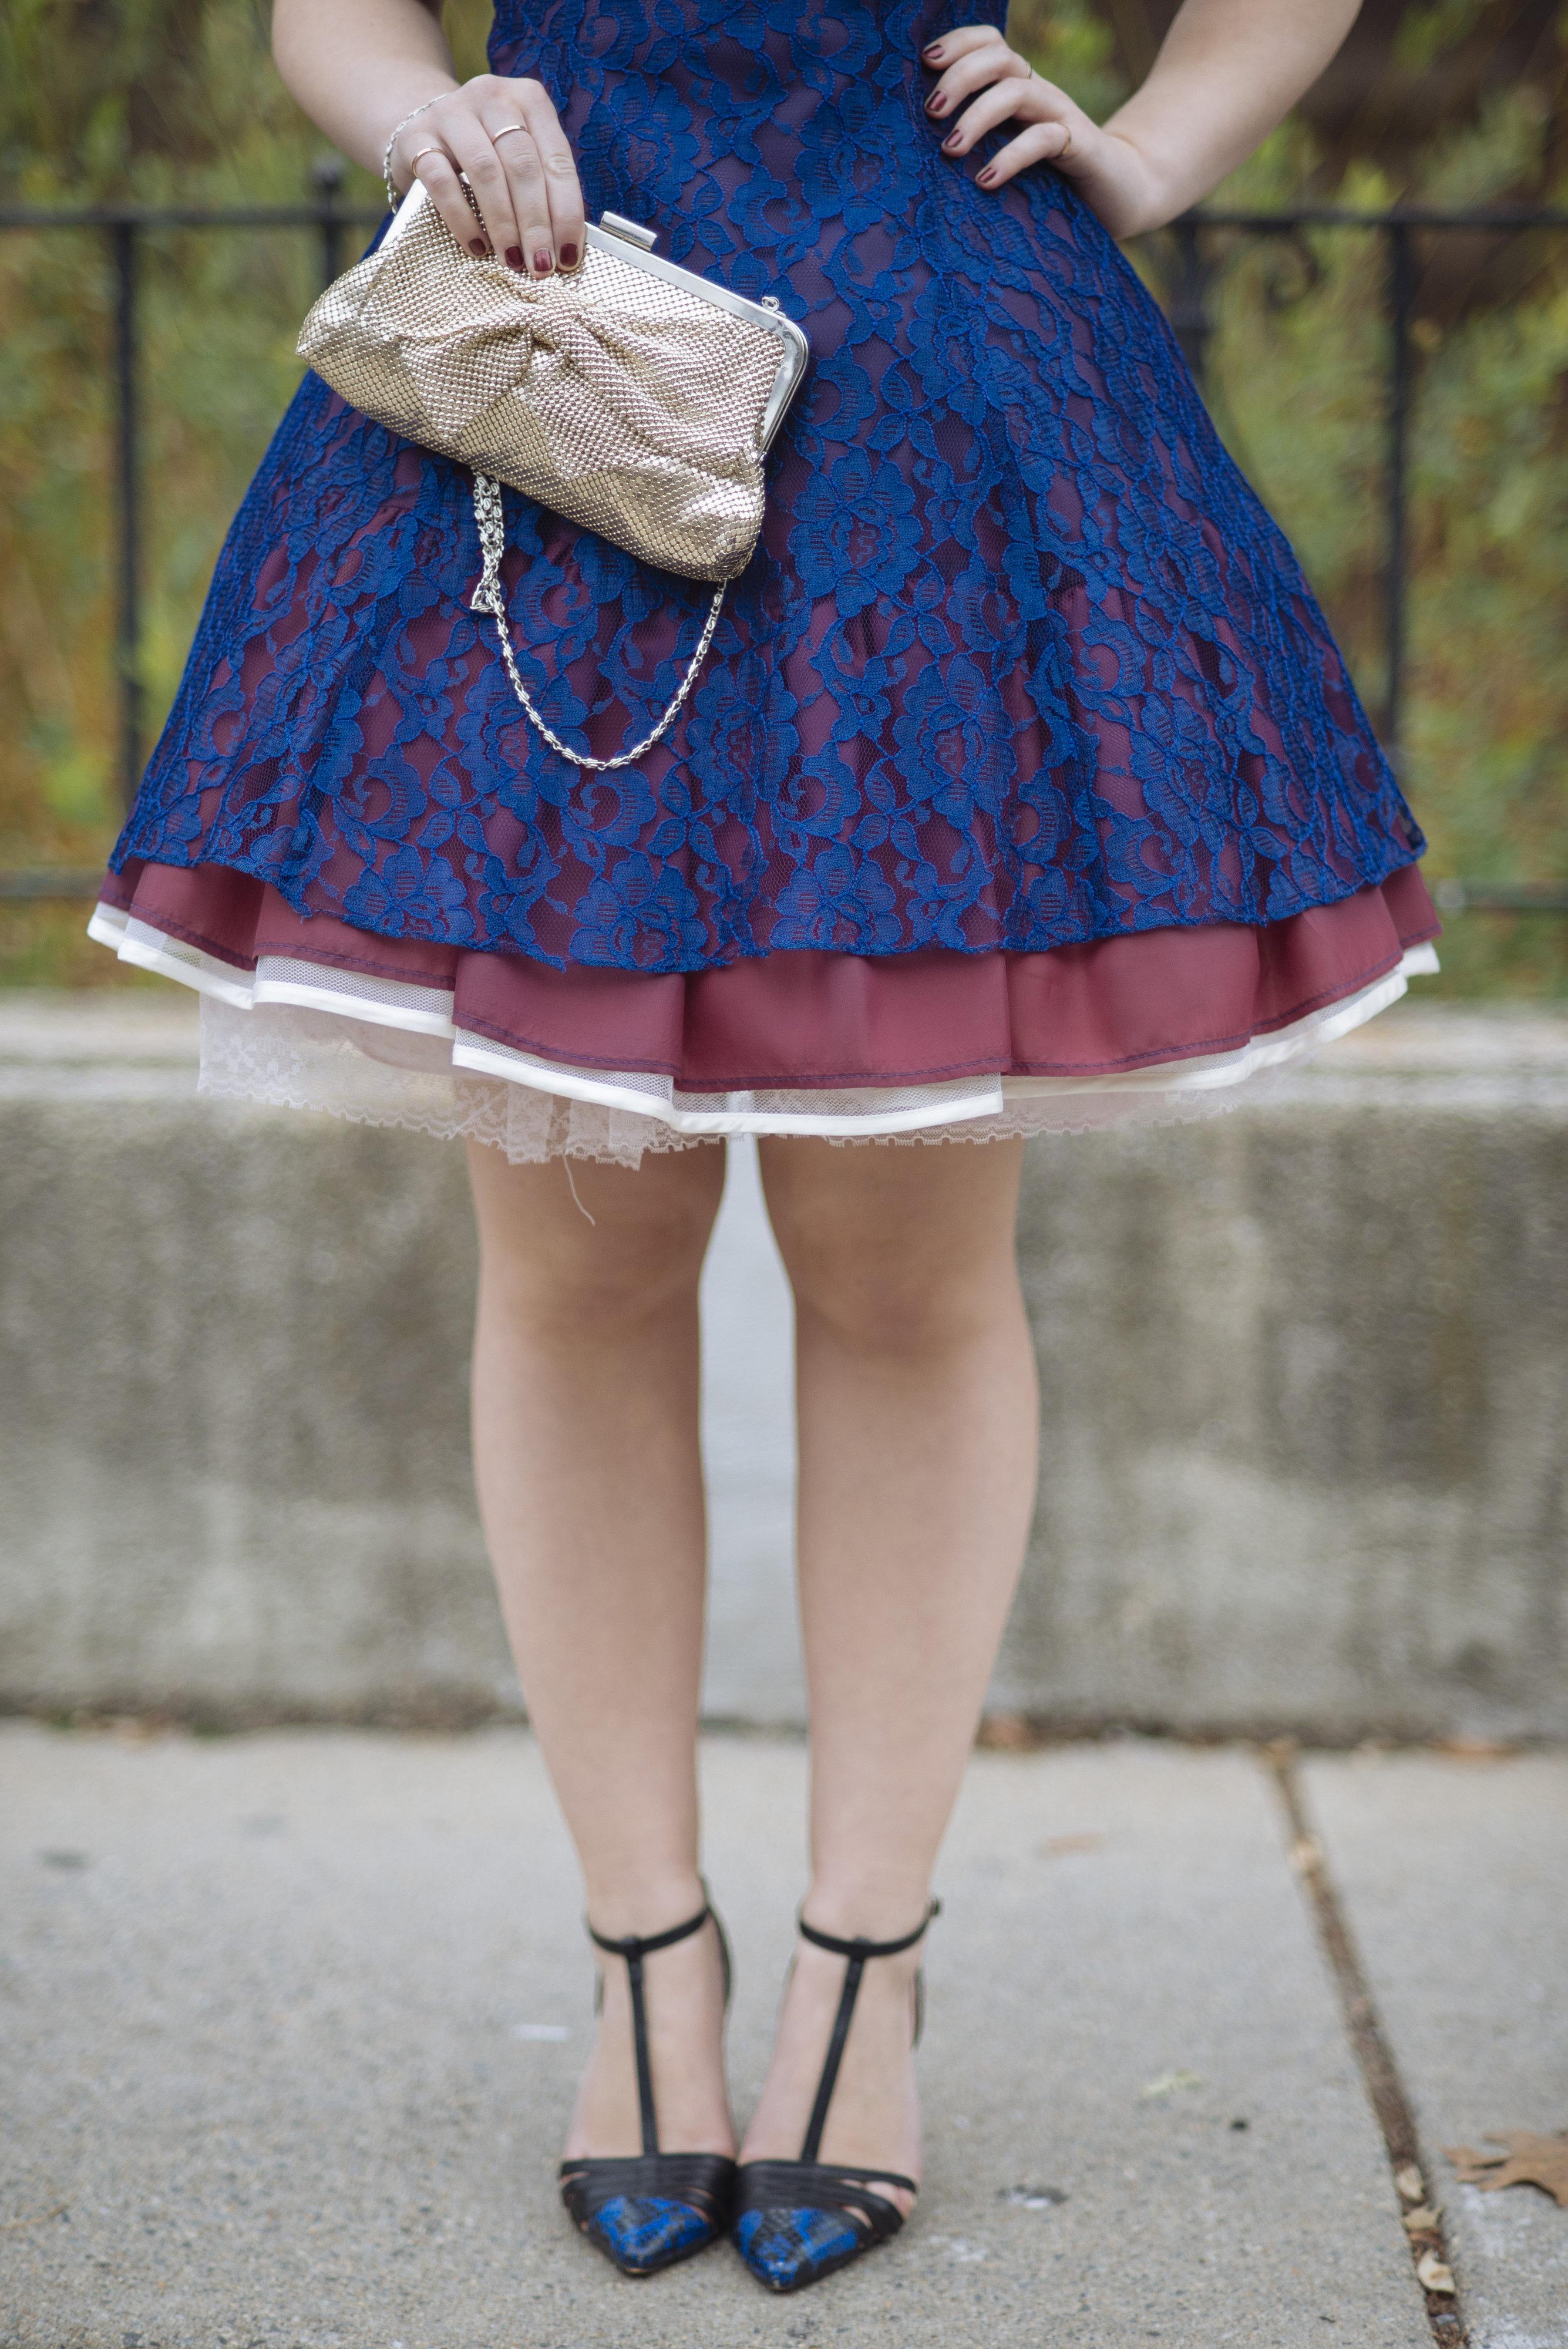 View More: http://stephanieritaphoto.pass.us/celina-december